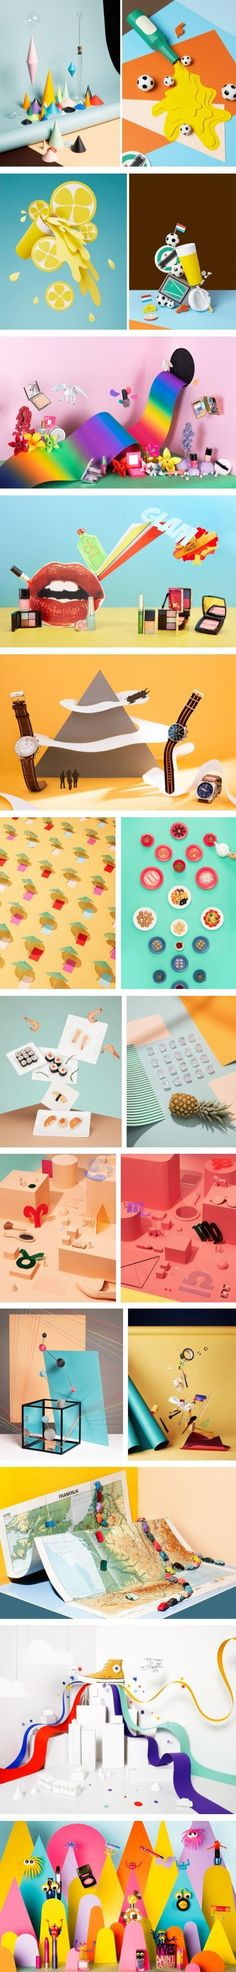 Pin de Flo H. en ▲Set design  Styling   Pinterest